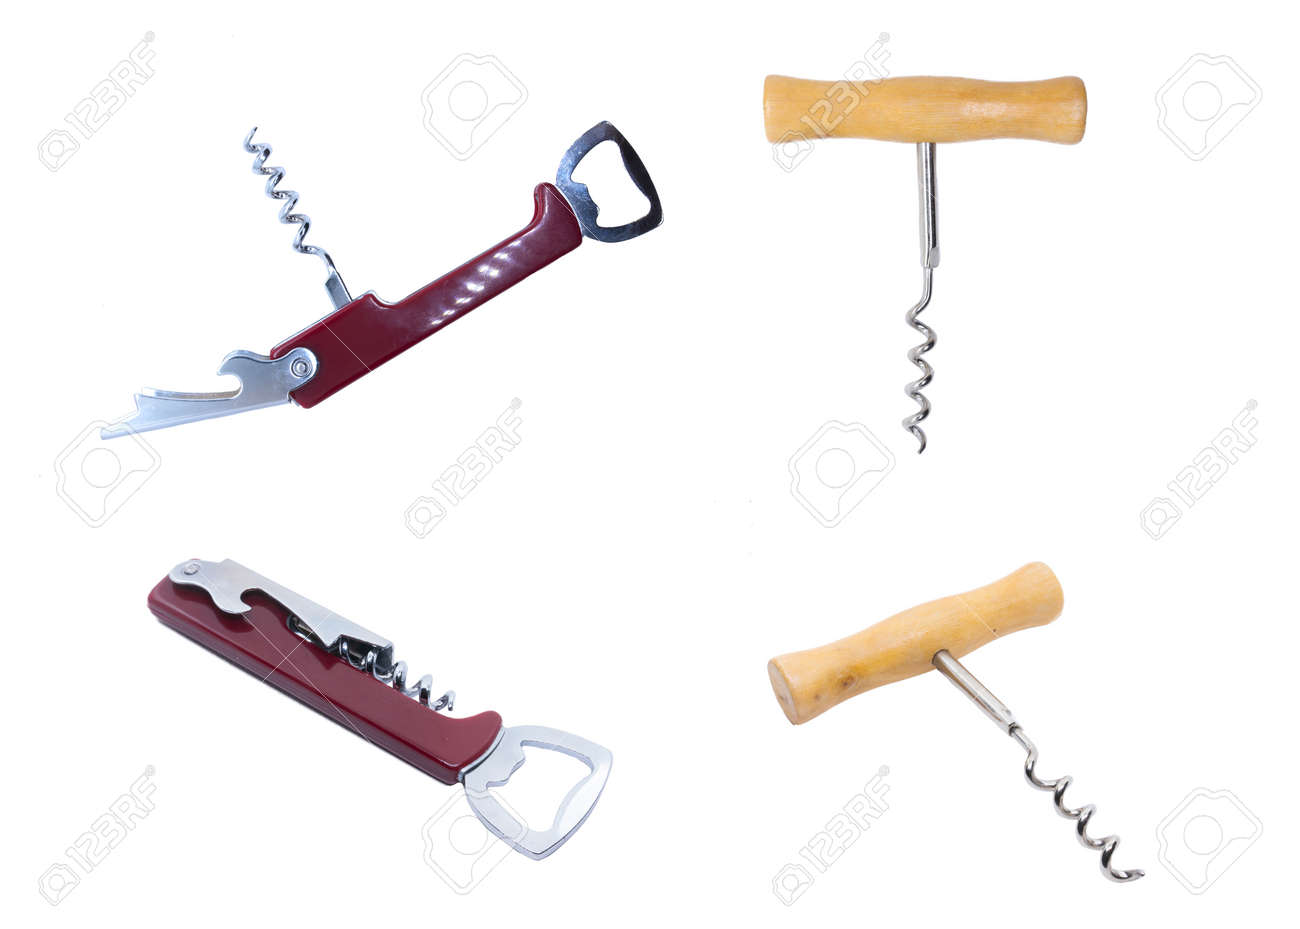 Red modern universal corkscrew. Classic wooden corkscrew for wine. Kitchen corkscrew isolated on white - 132225082